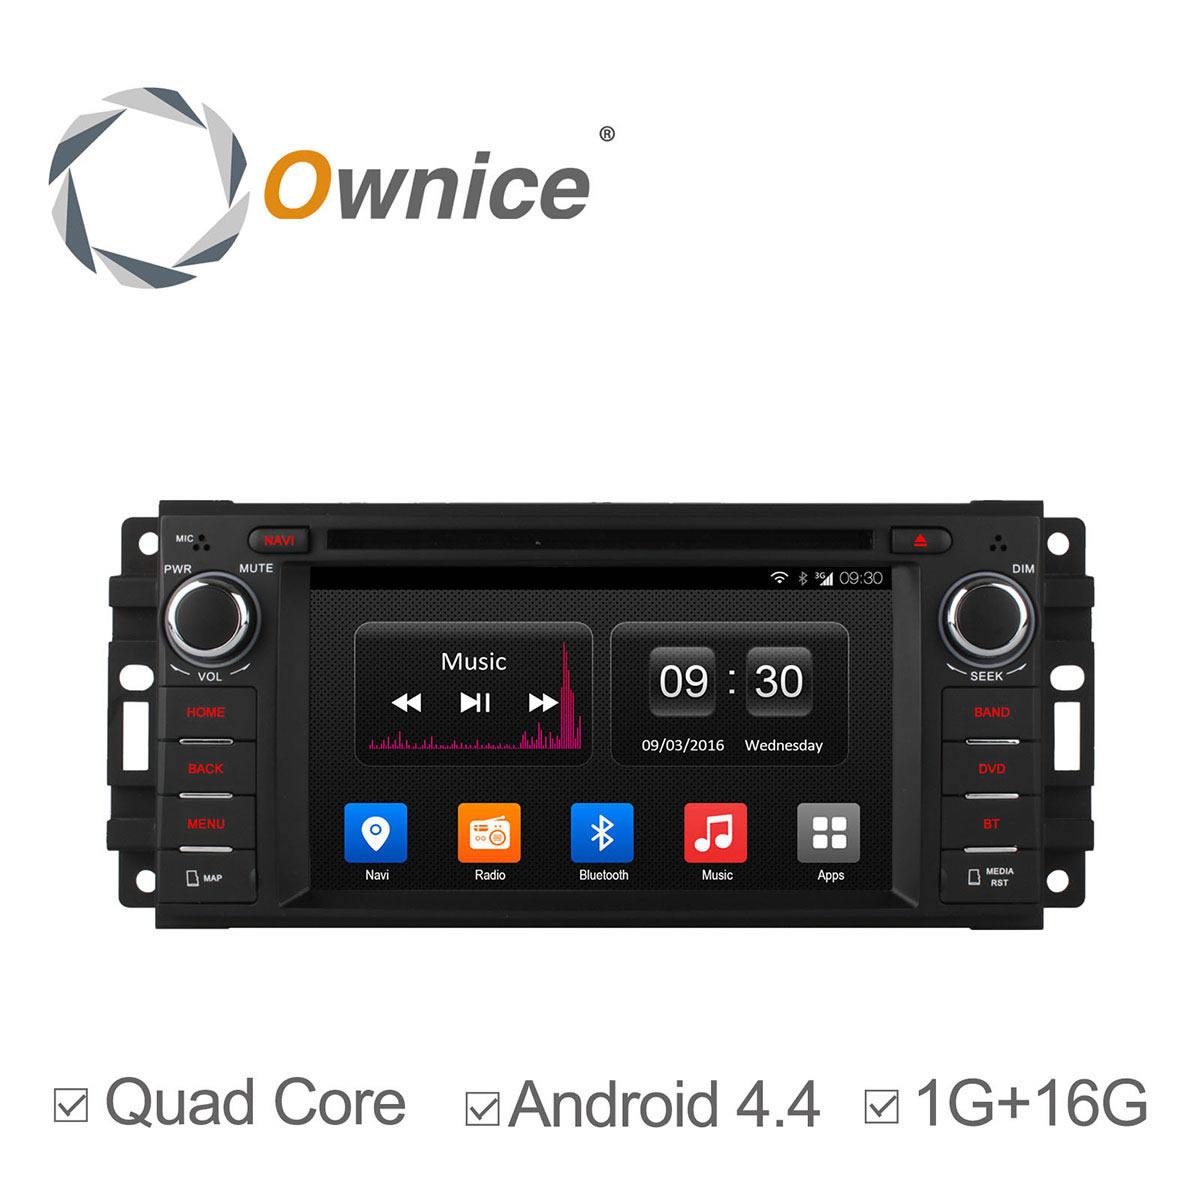 2006 Chrysler 300 C Sedan 4: Ownice Android 4.4 Stereo Quad Core Car DVD GPS Radio For